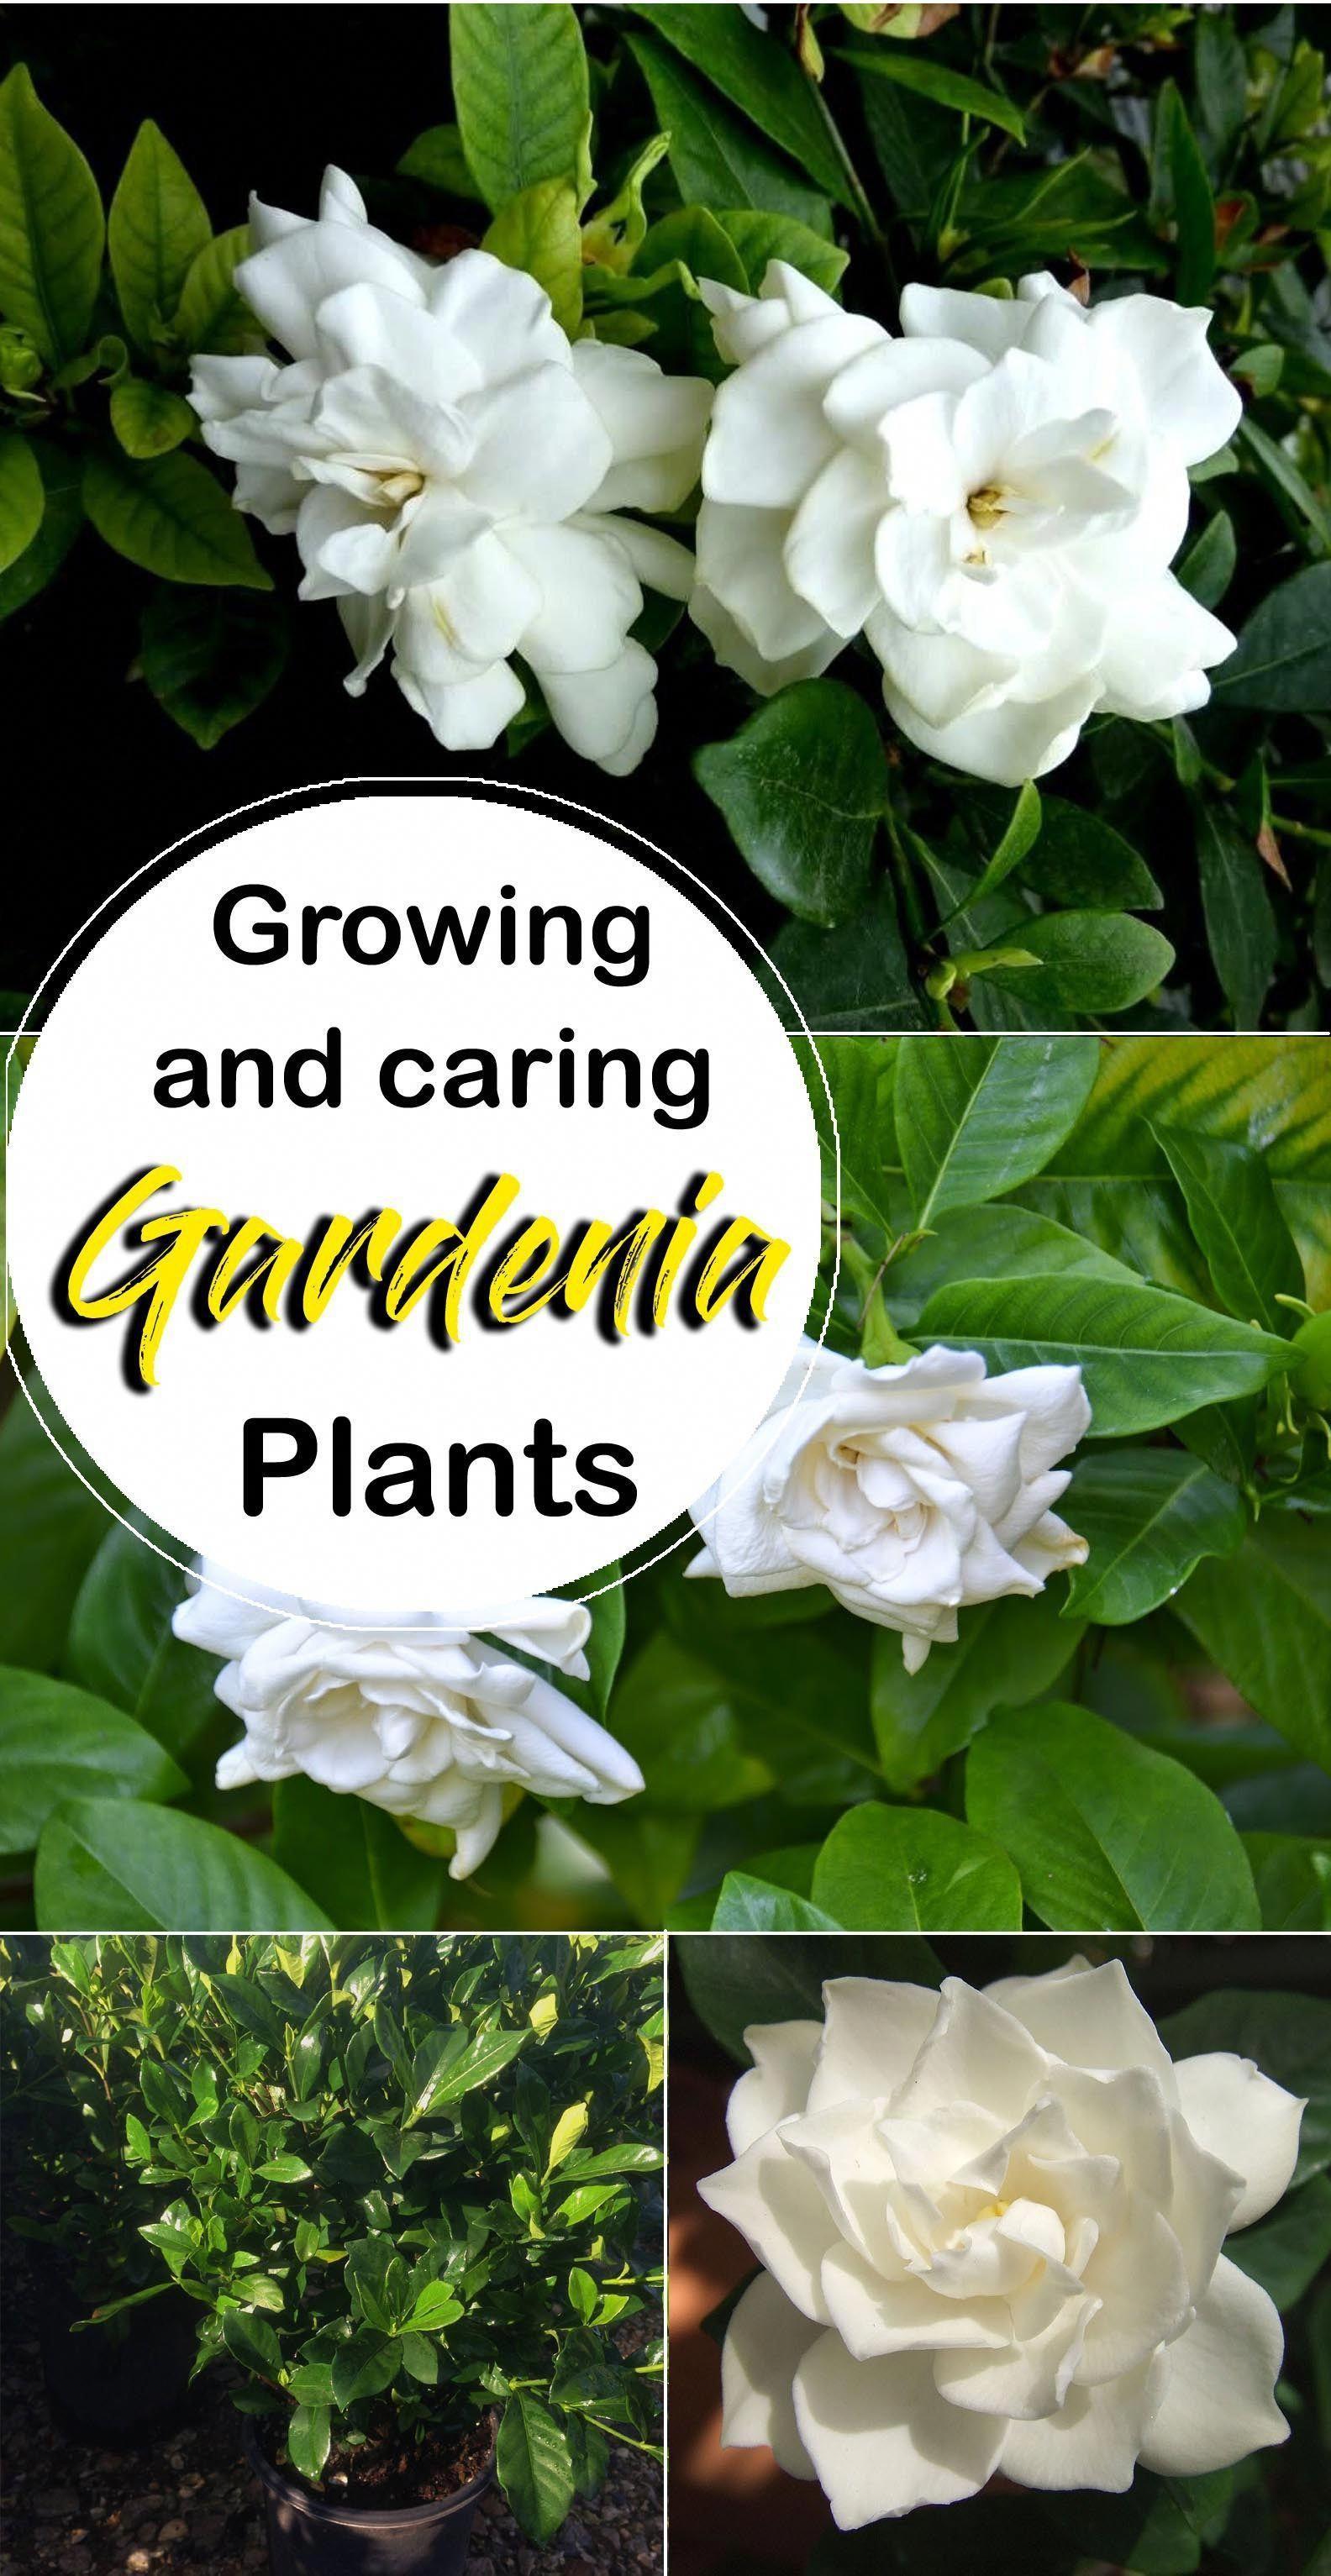 Foodstoragetips Gardeningtipsonterrace In 2020 Gardenia Plant Growing Gardenias Gardenia Trees